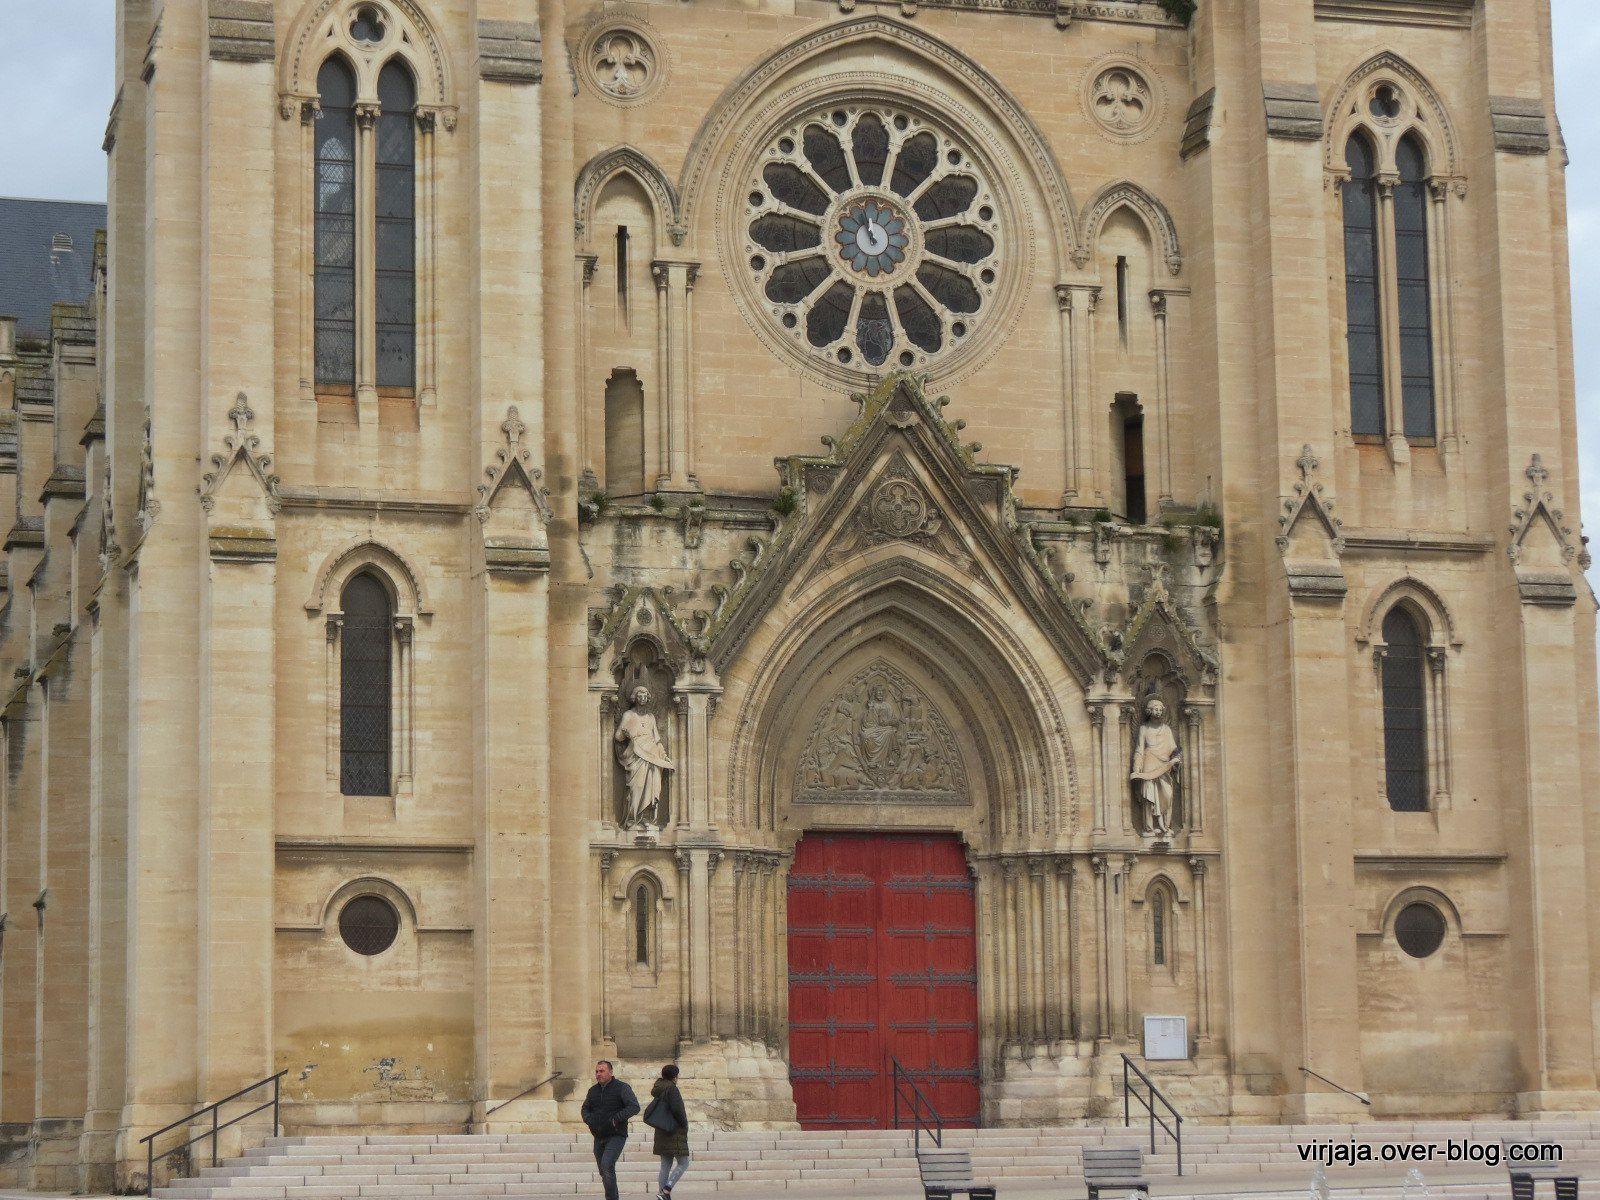 église Saint-baudile, Nîmes